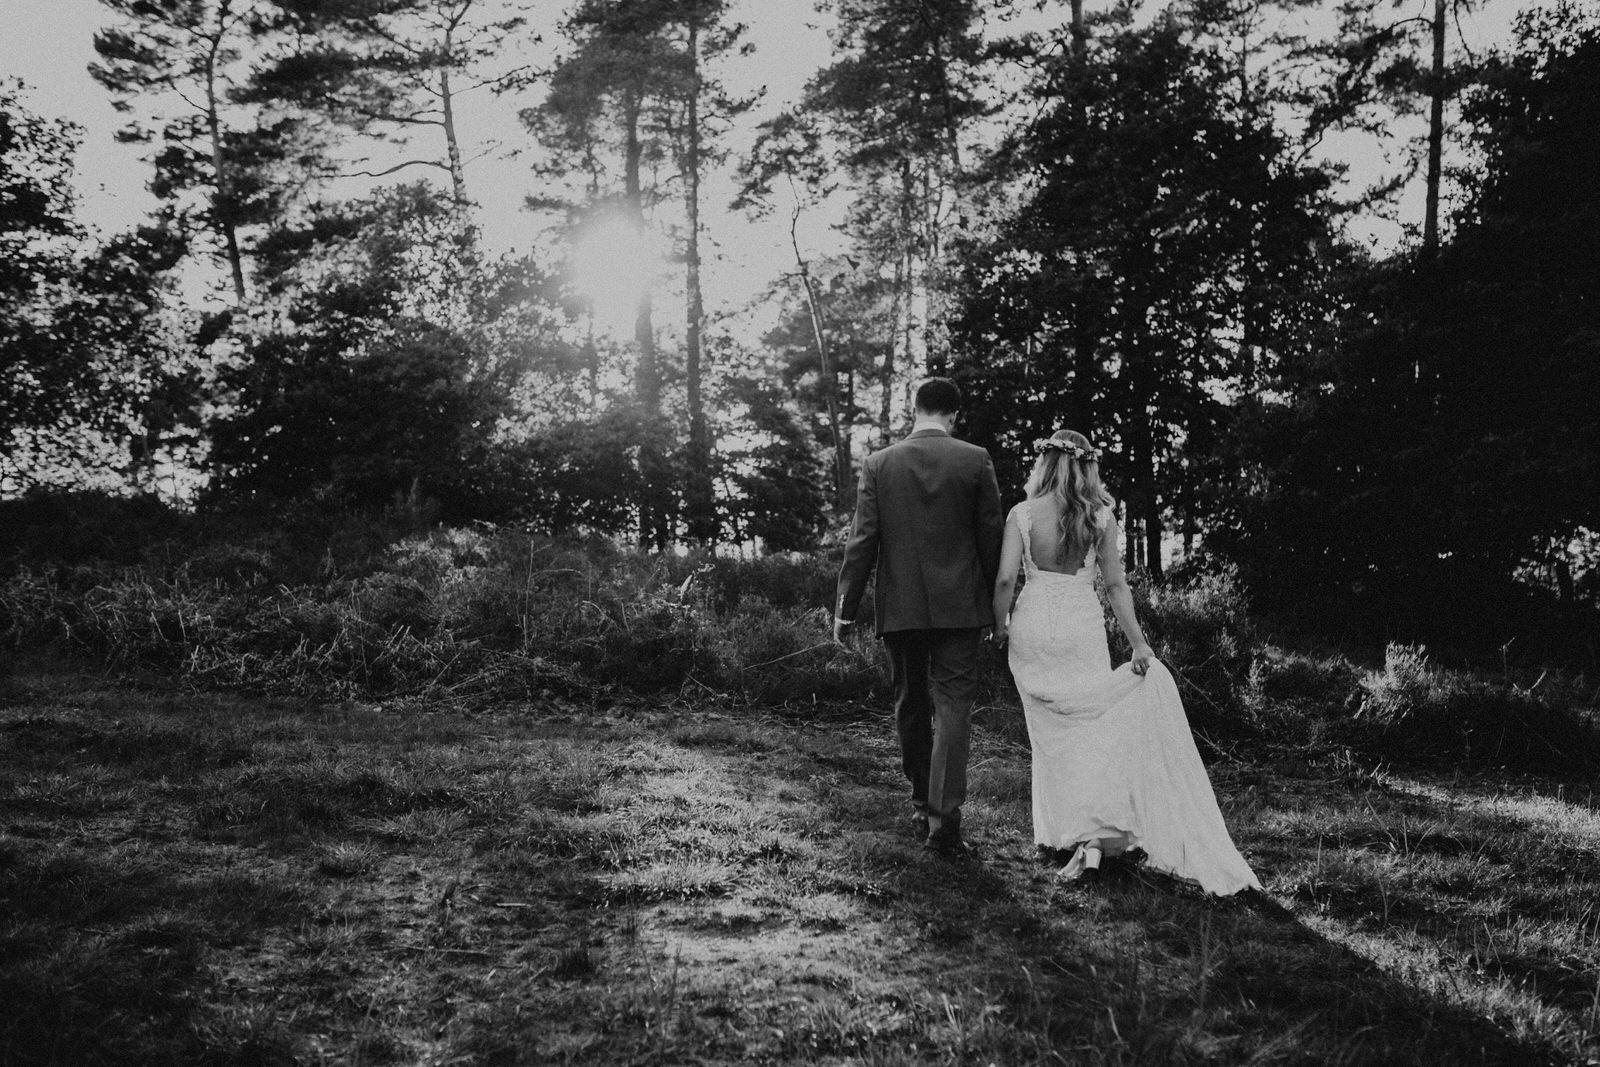 006Melle + Thomas After Wedding Shooting 5.5.18.jpg